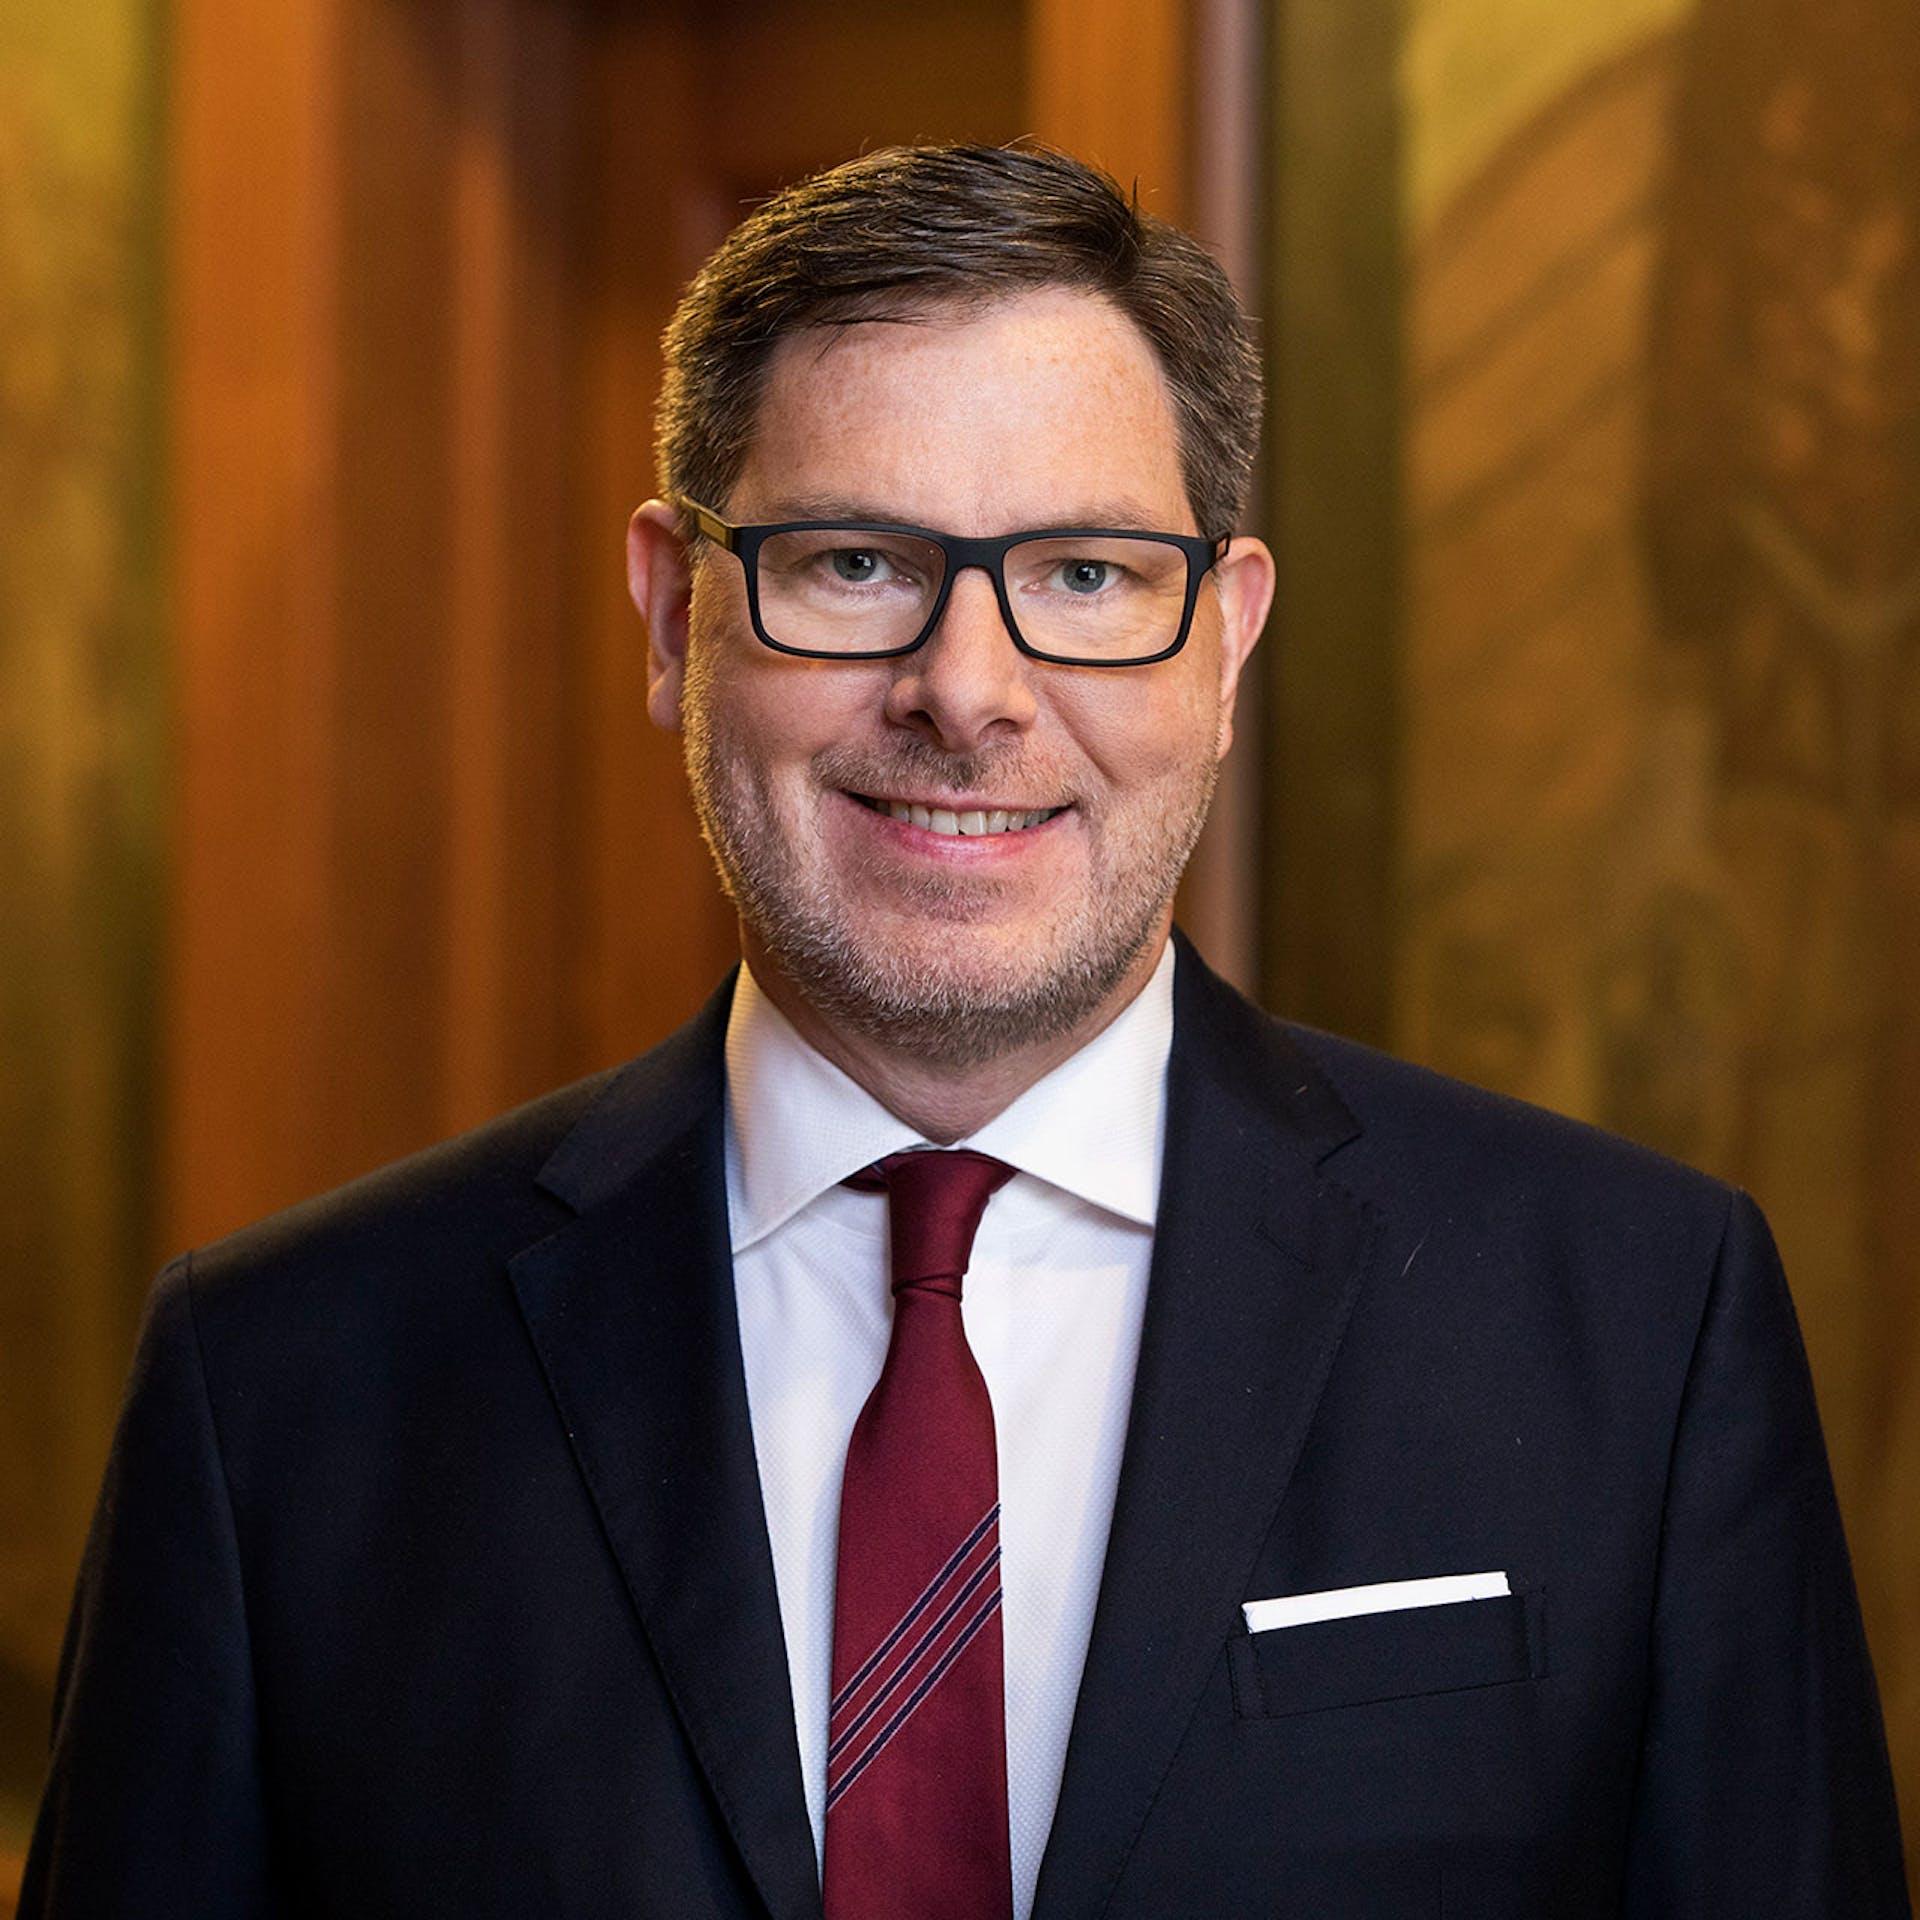 Thorvaldur Jacobsen